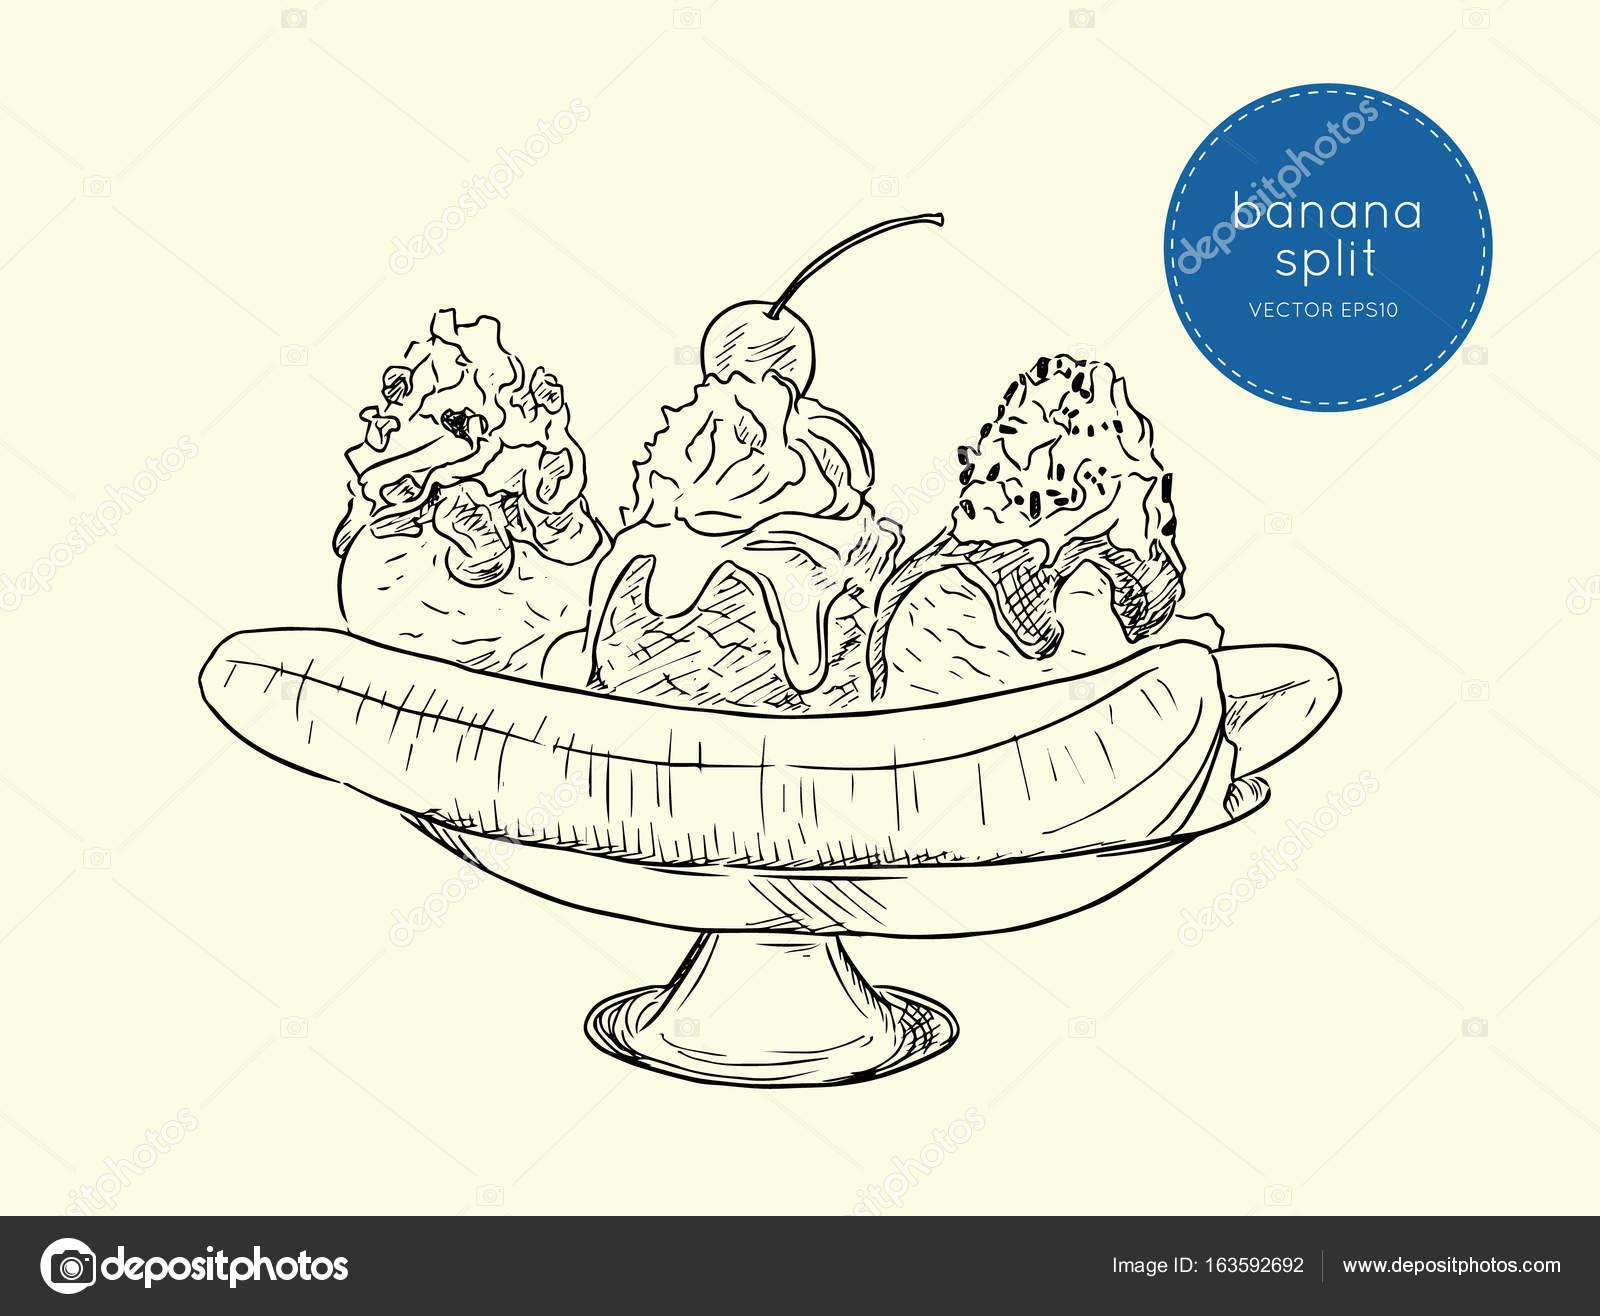 Leckere süße Bananen split Eis Dessert, Skizze Vektor — Stockvektor ...